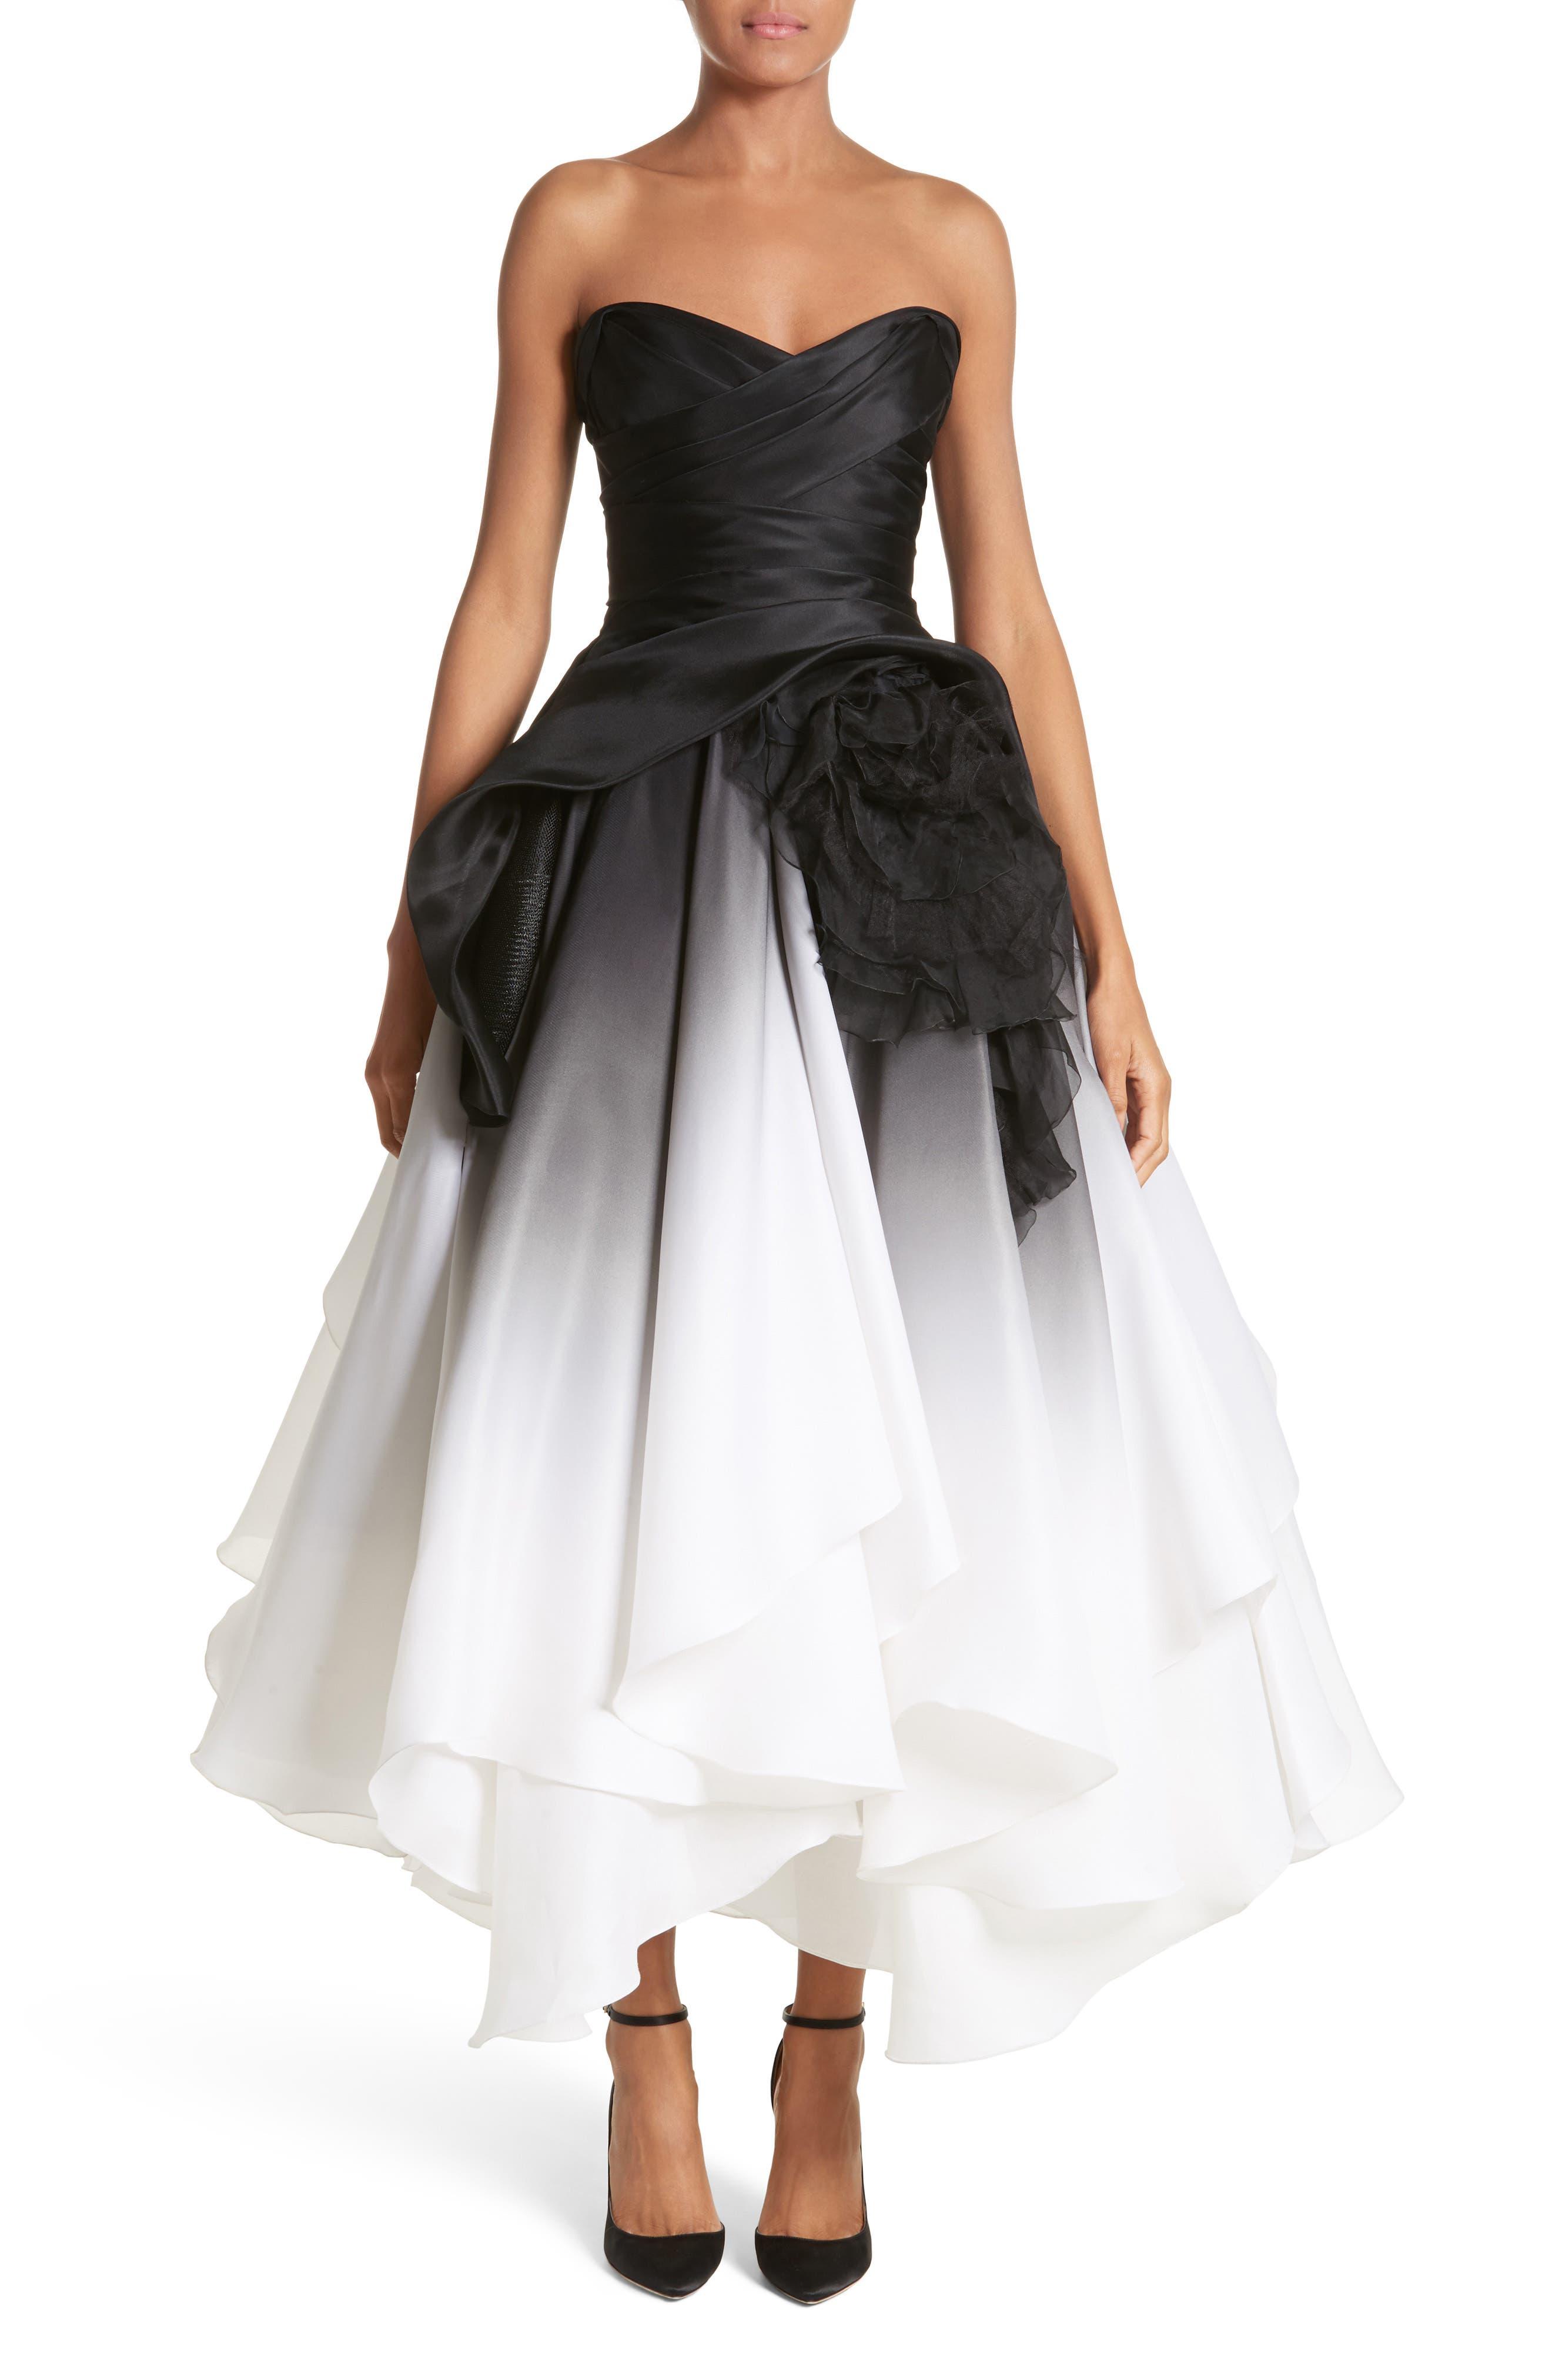 Ombré Strapless Tea Length Dress,                         Main,                         color, 001